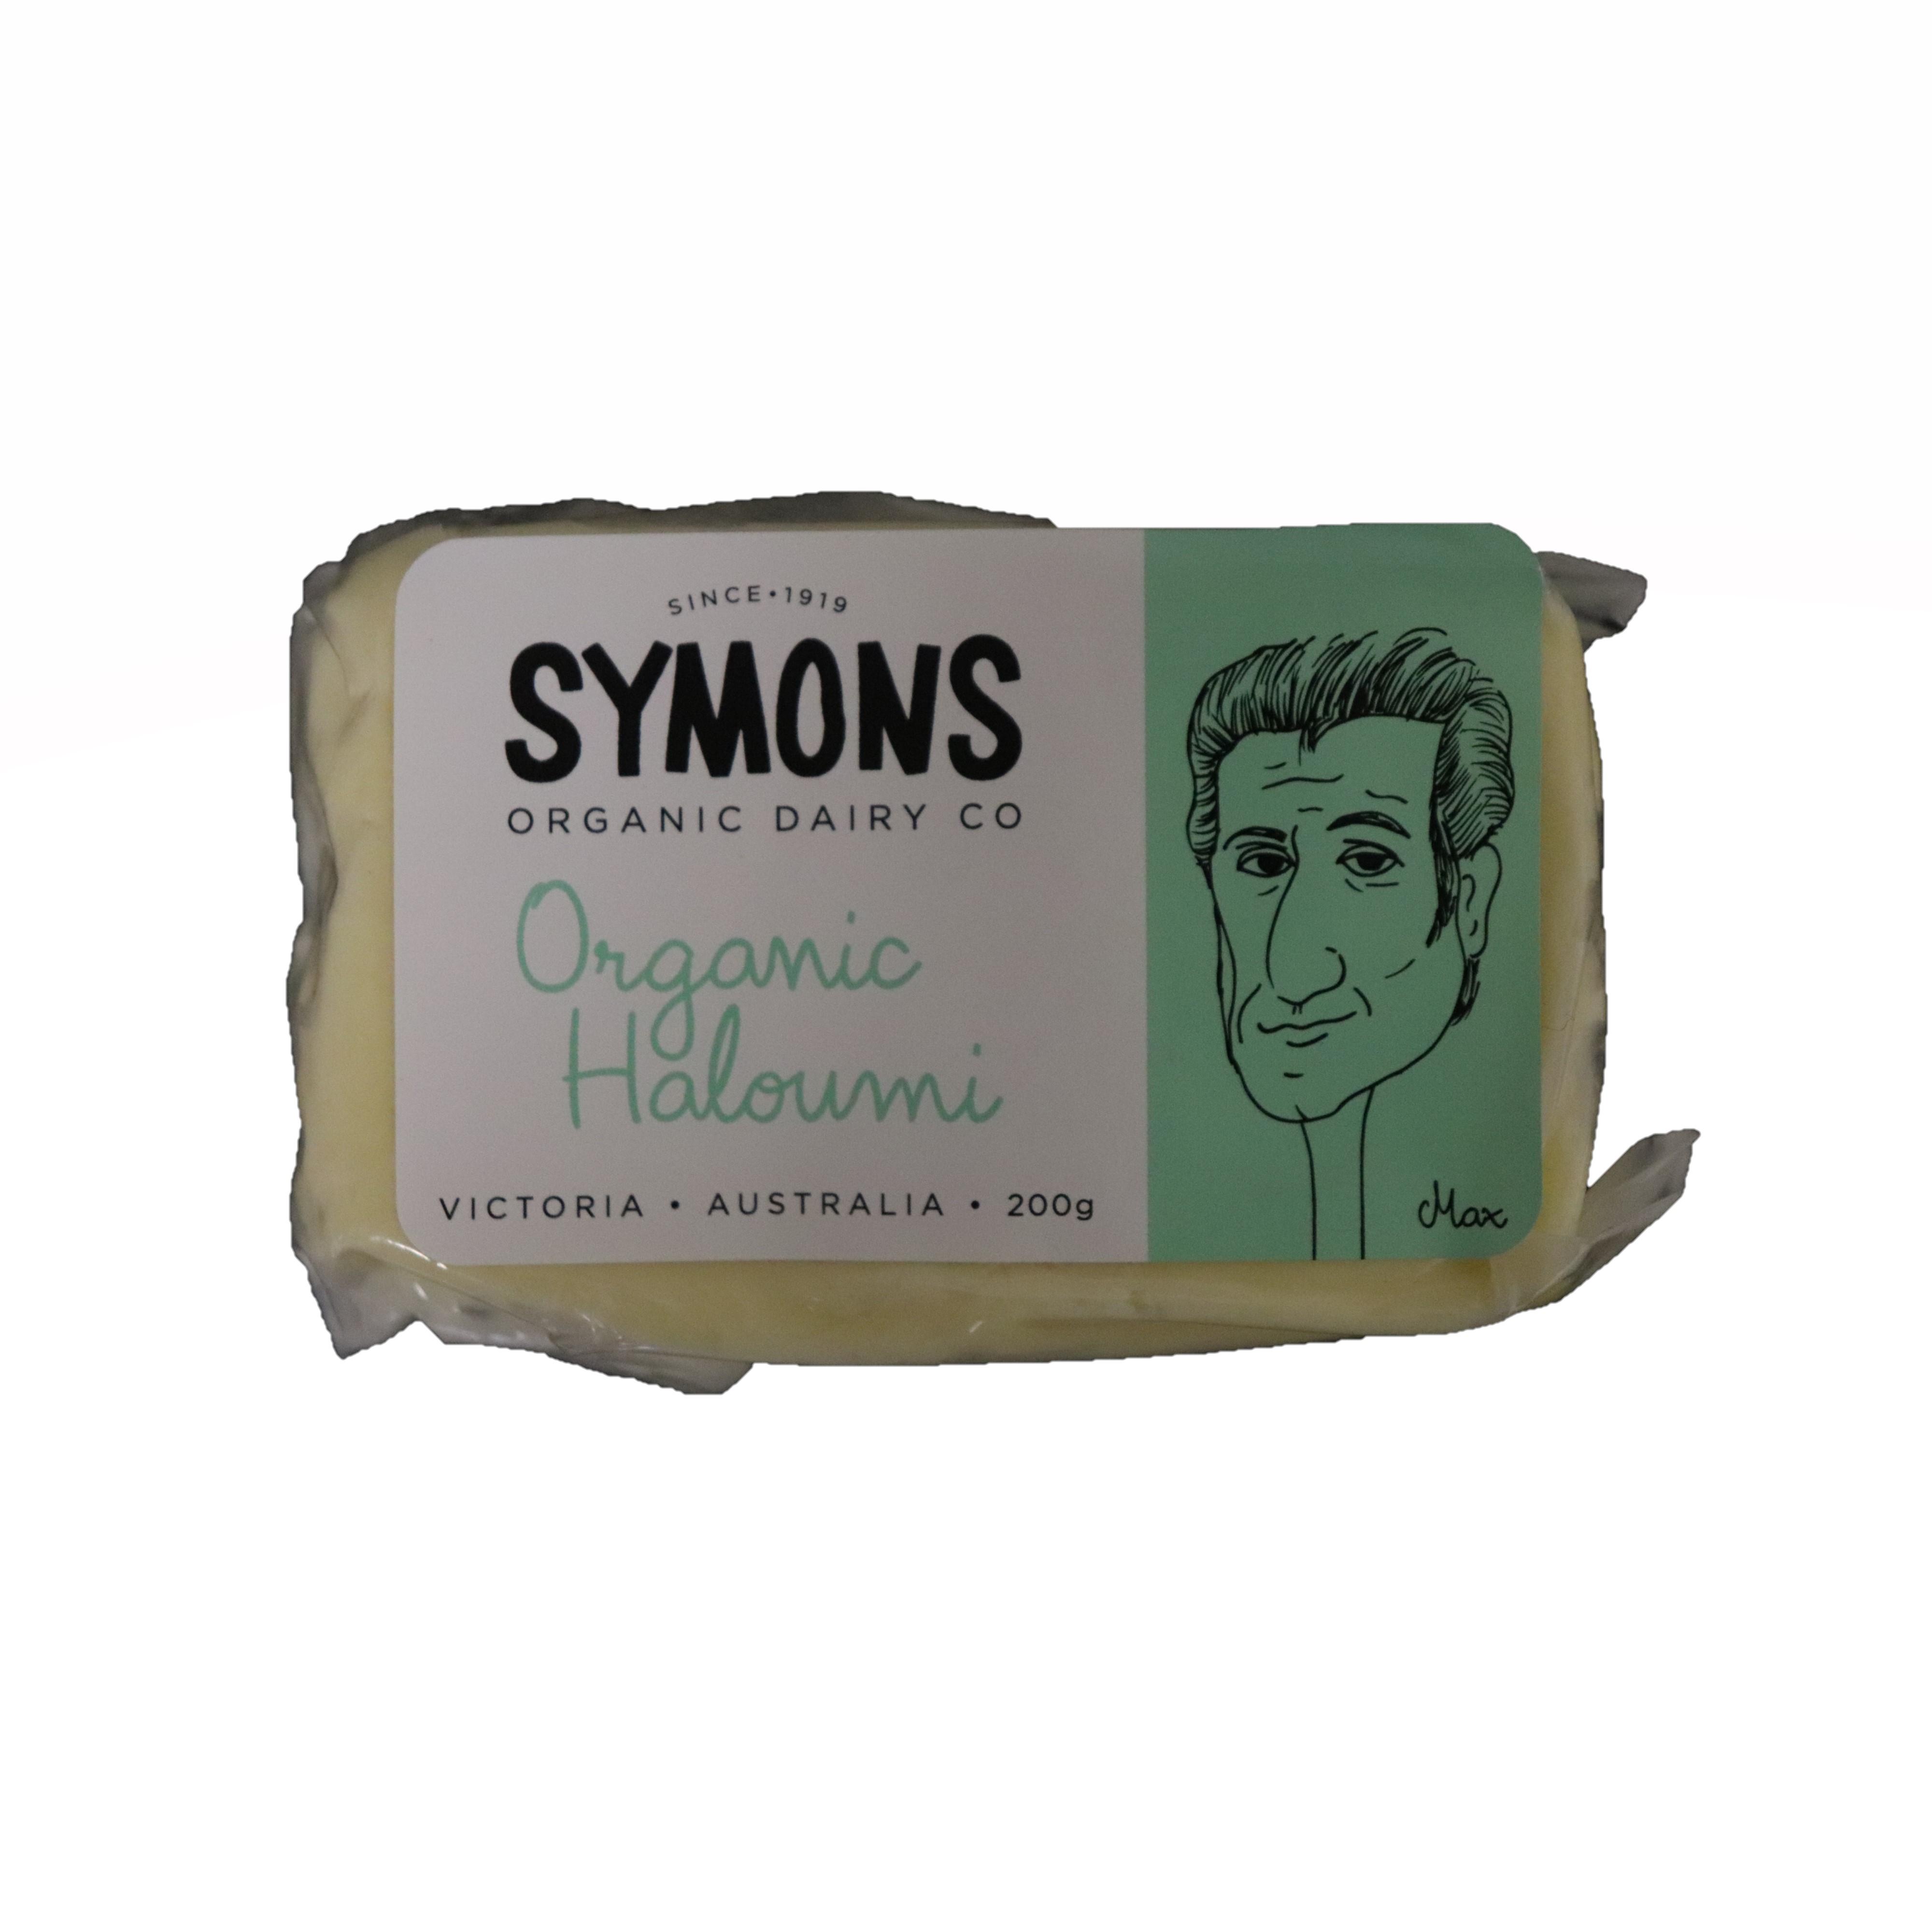 Symons Organic Dairy Co